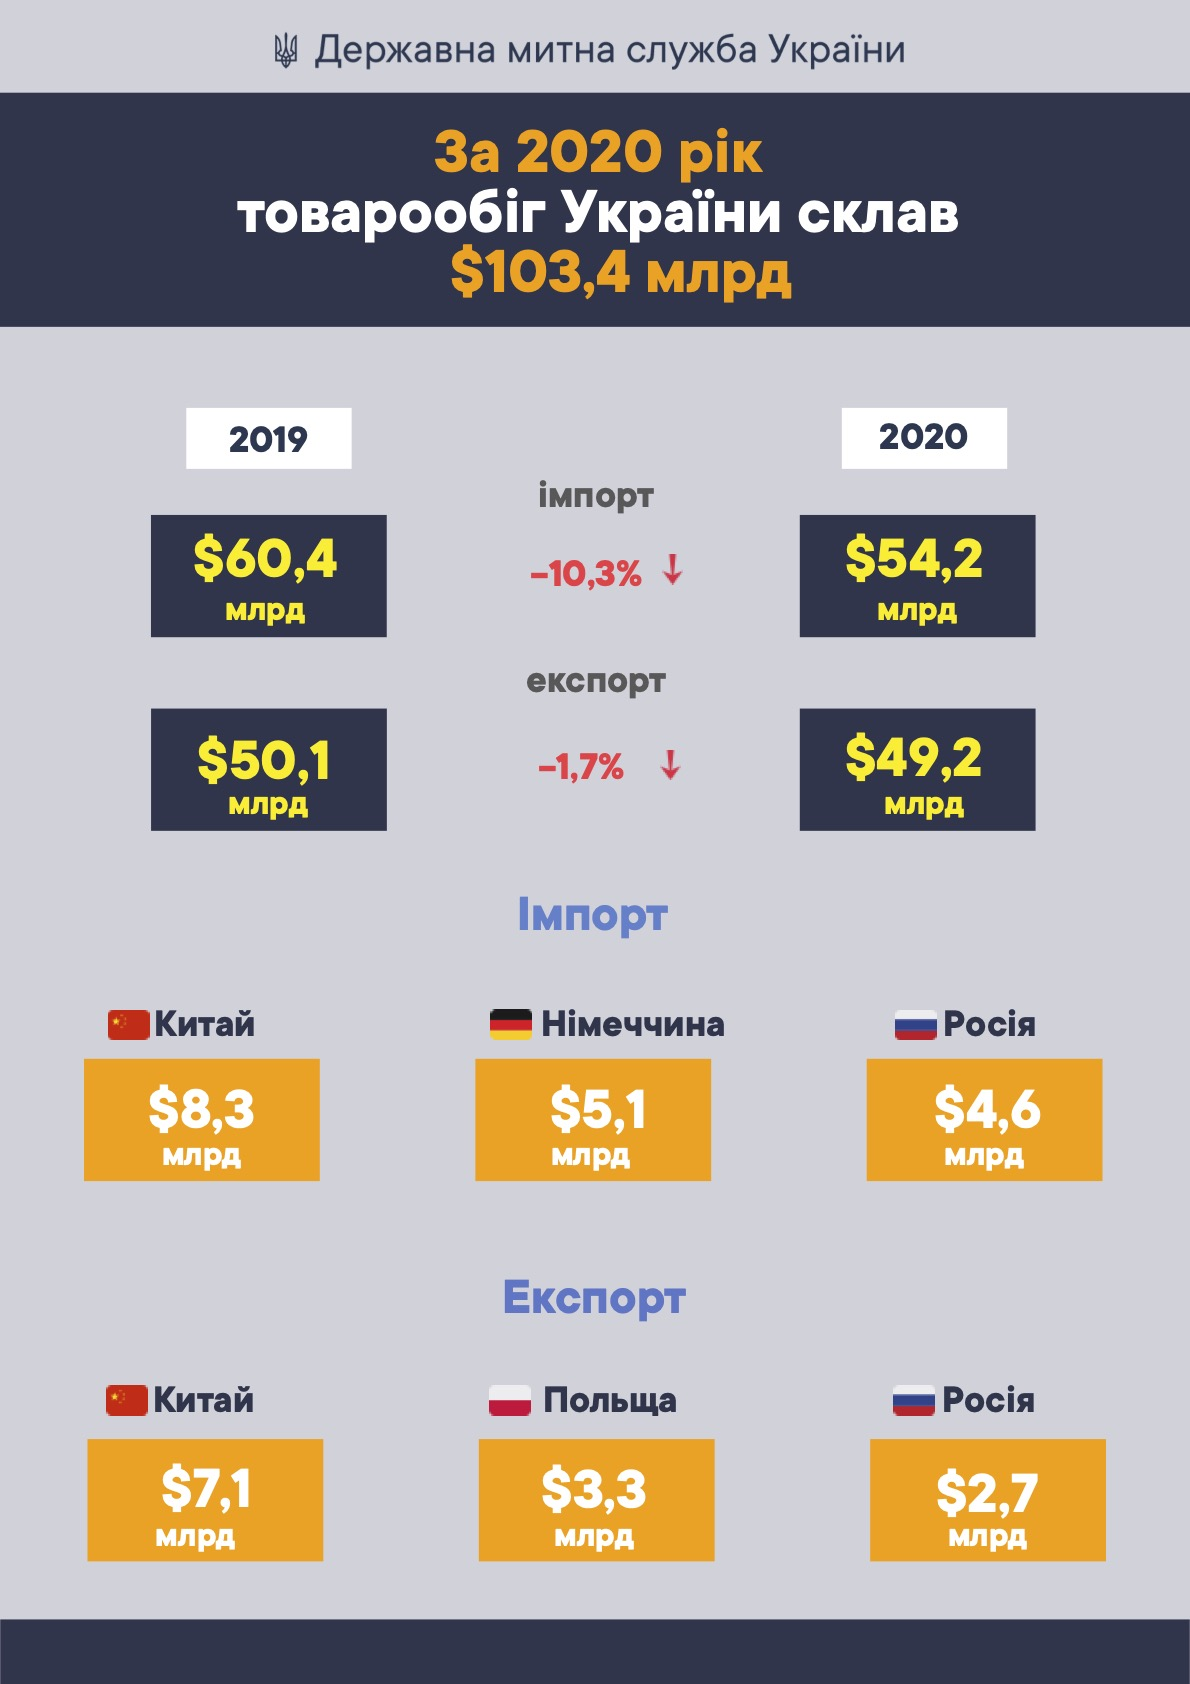 2020 года товарооборот Украины составил $103,4 млрд